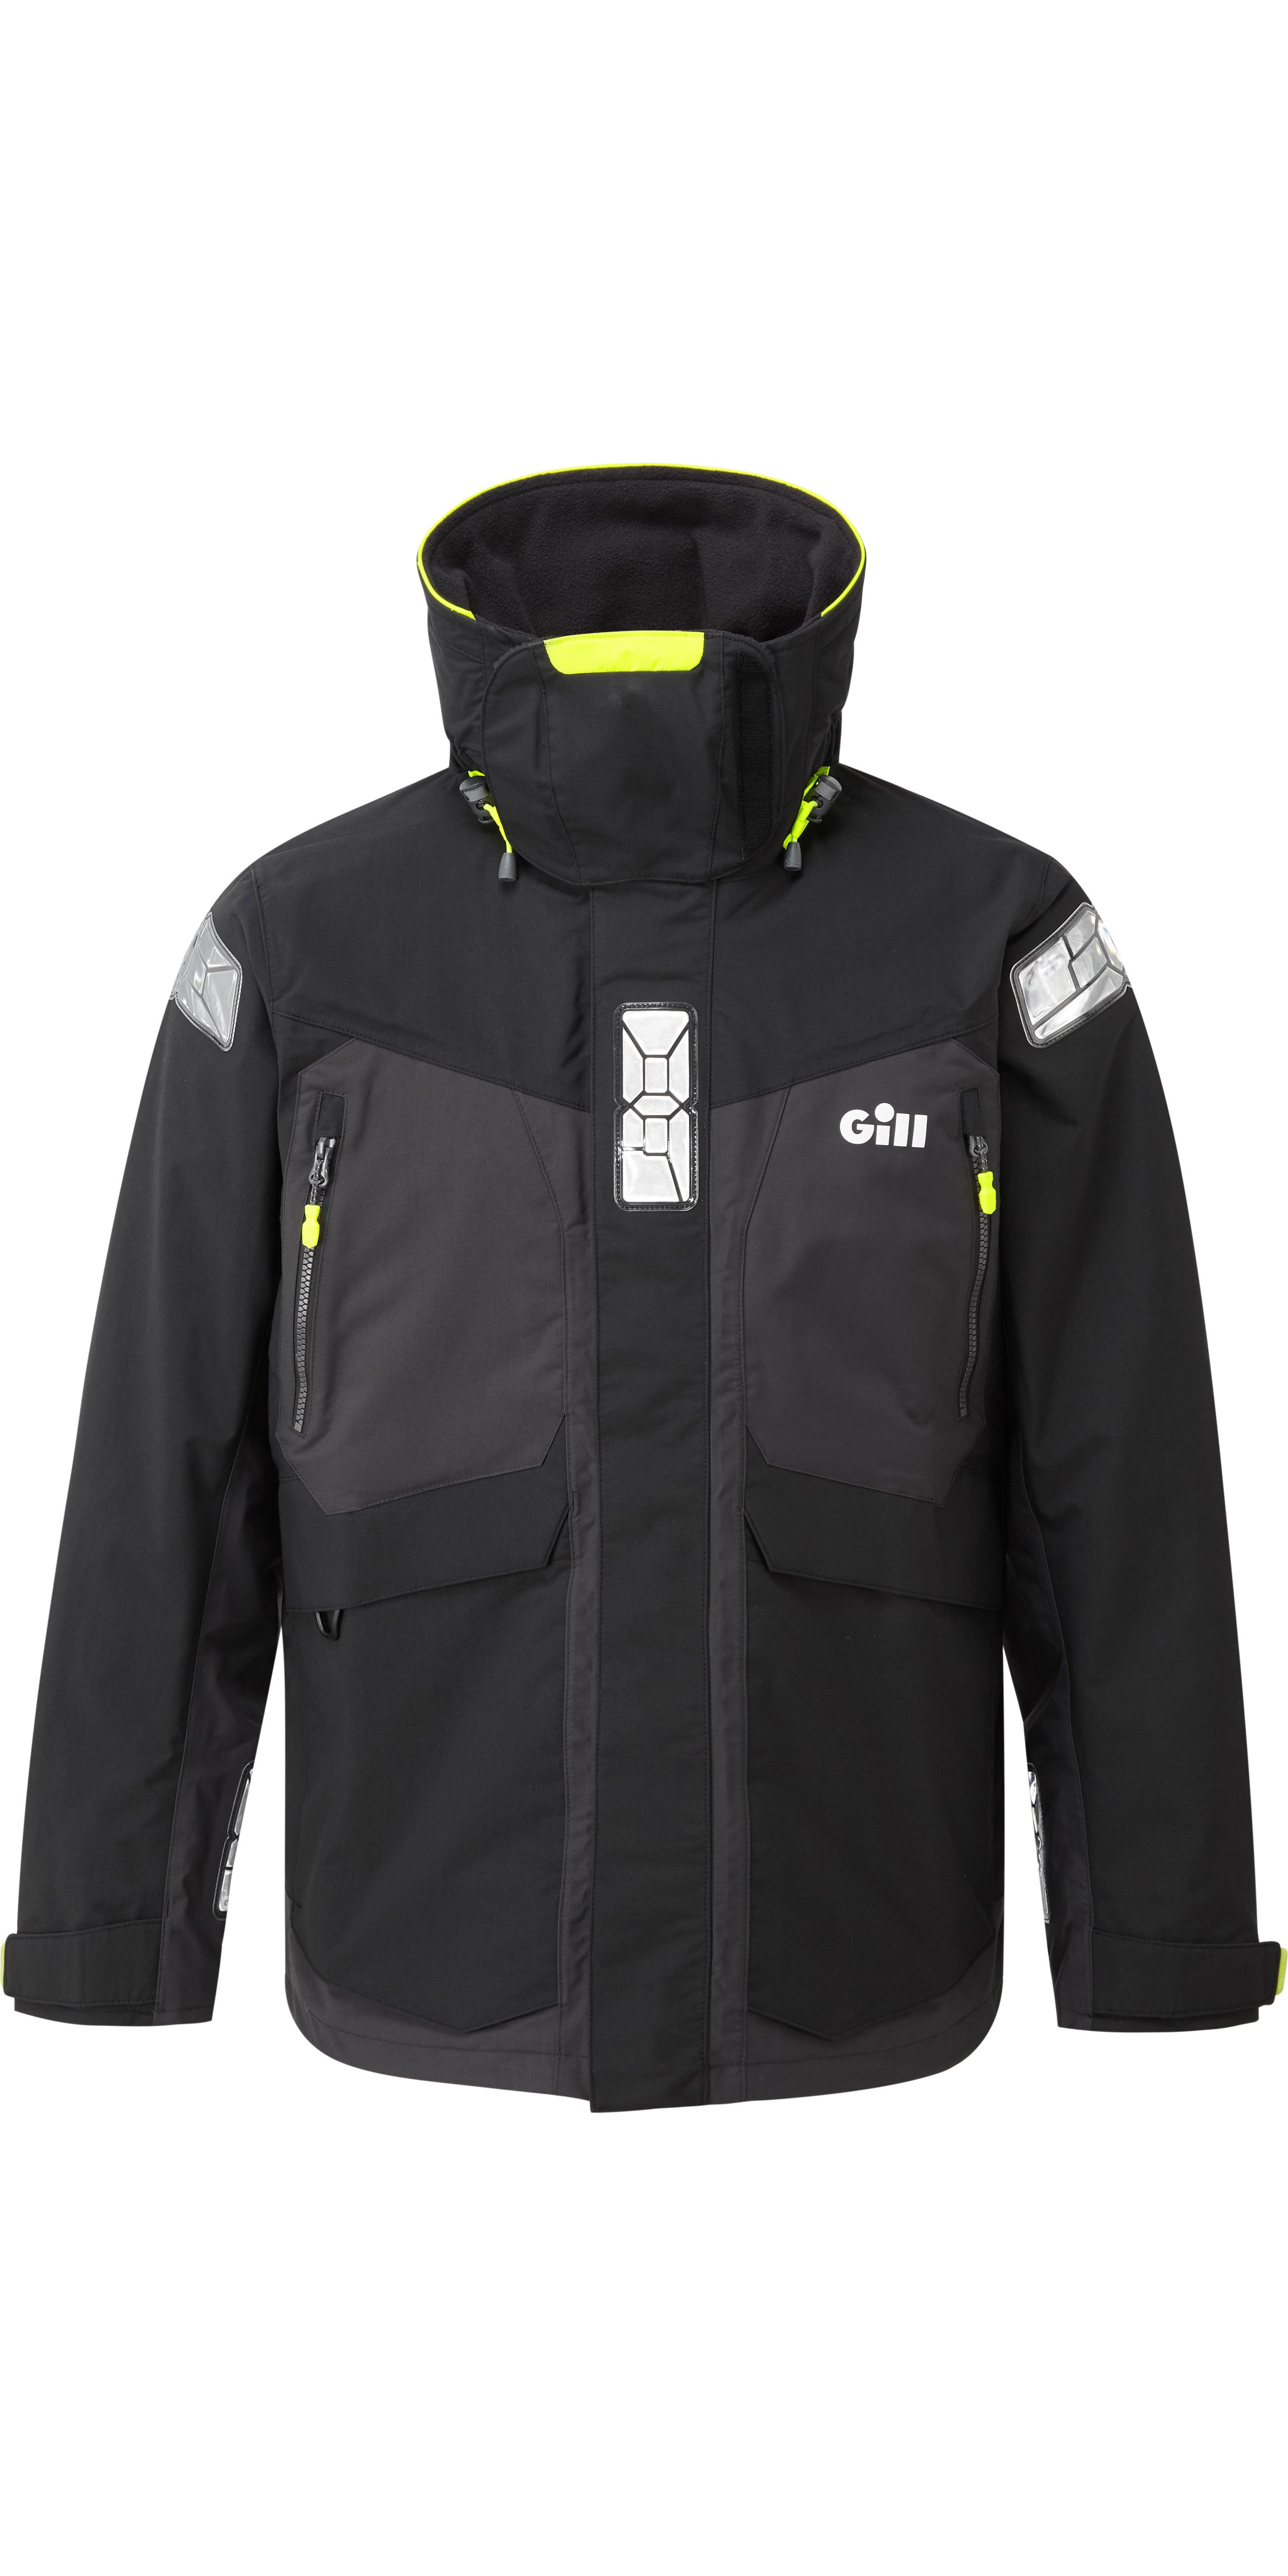 1f673dc7b 2019 Gill OS2 Mens Offshore Jacket Black OS24J